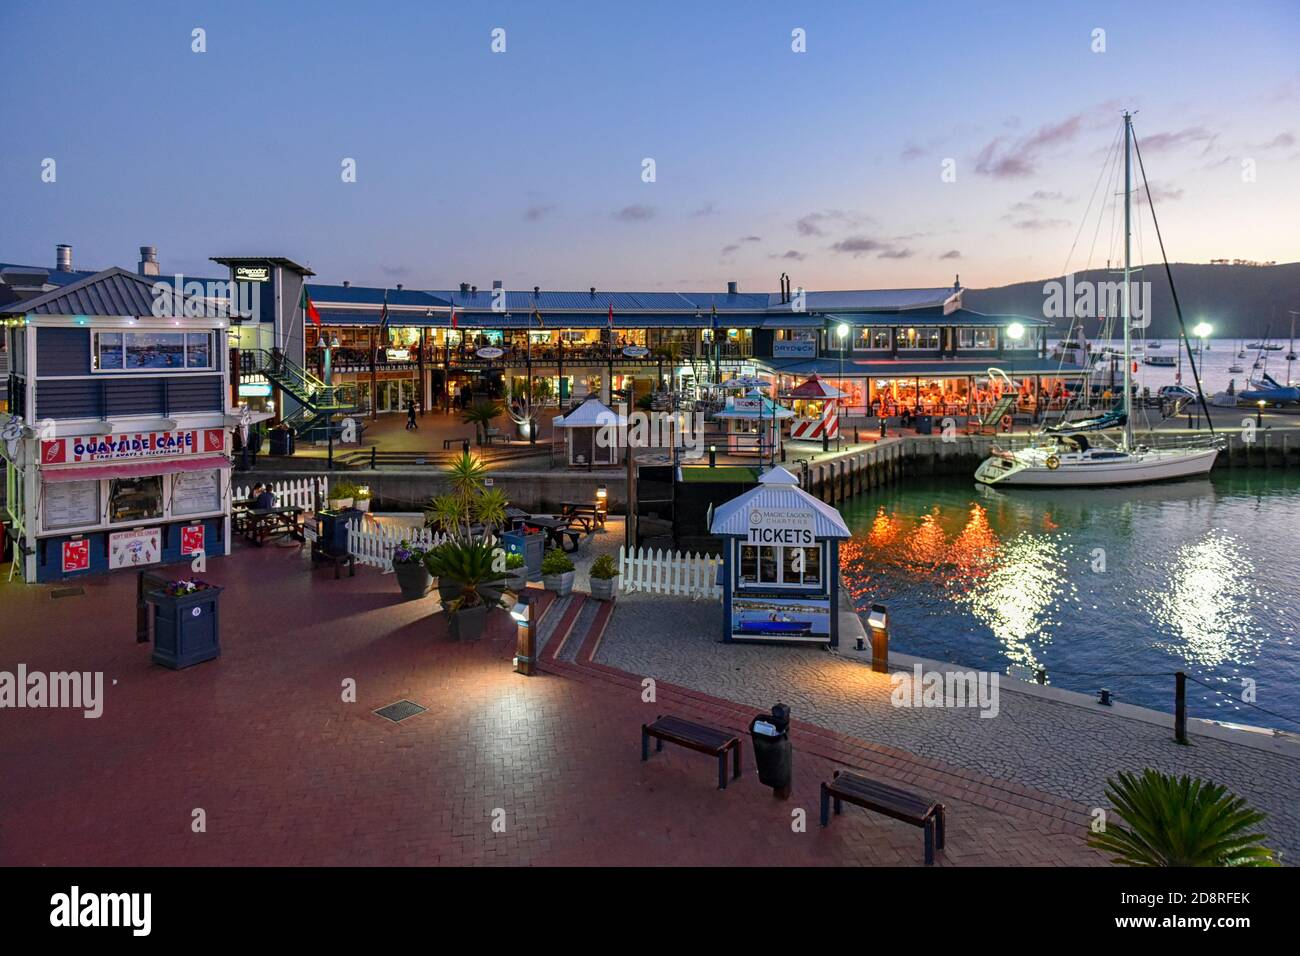 Knysna Waterfront at sunset, Knysna, Garden Route, South Africa Stock Photo